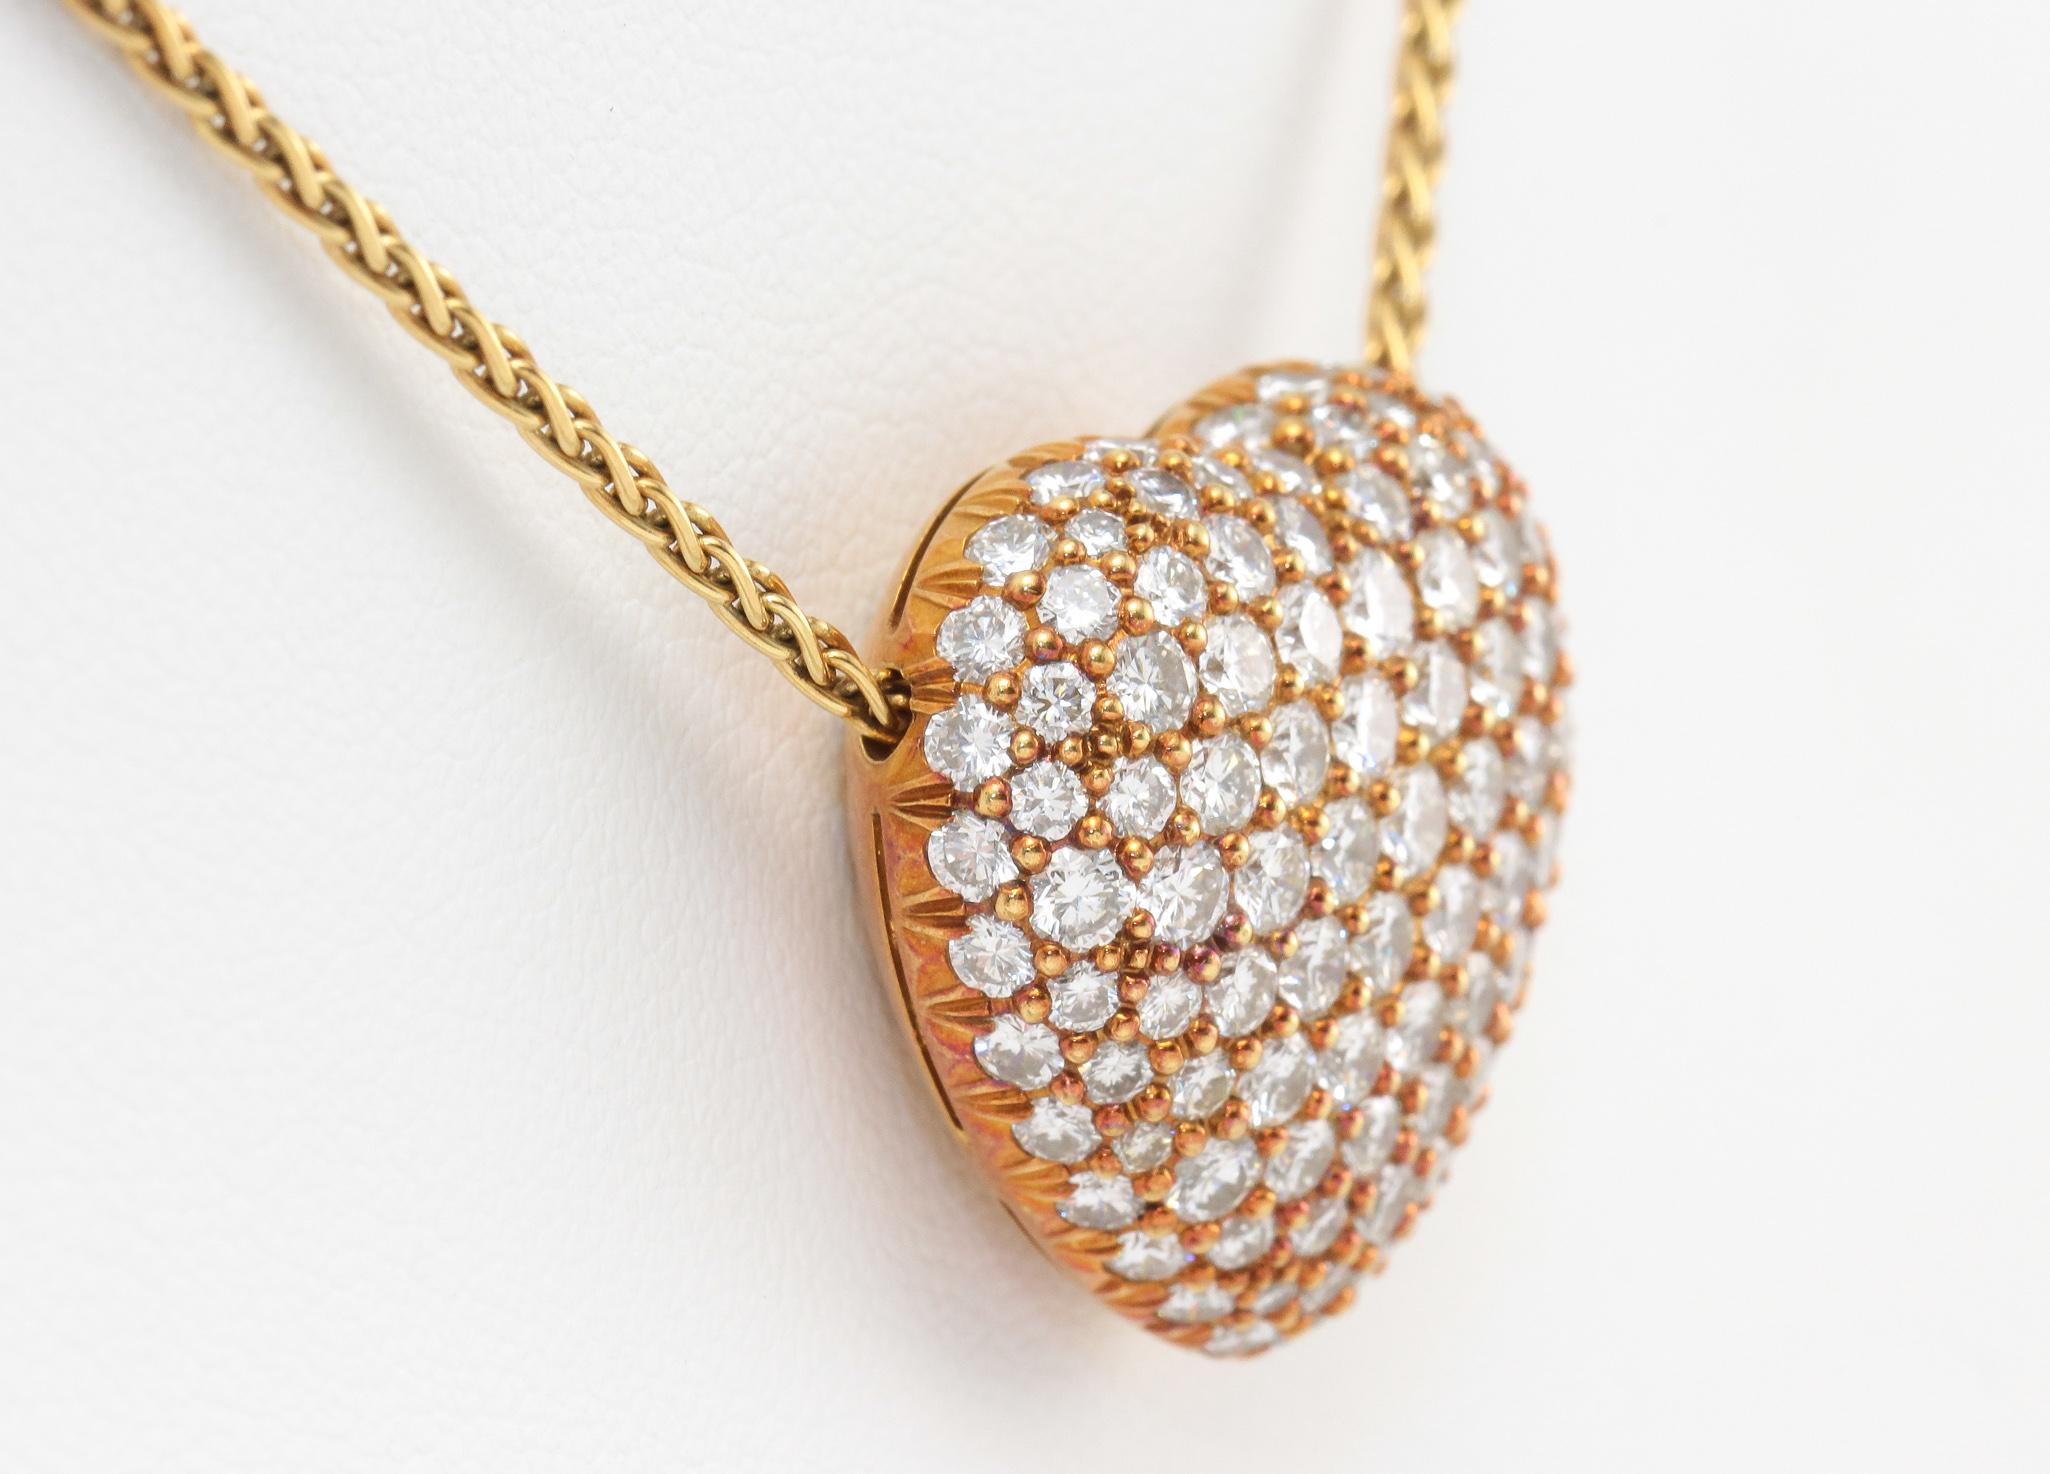 18k Kurt Wayne Diamond Heart Pendant Necklace Yellow Gold